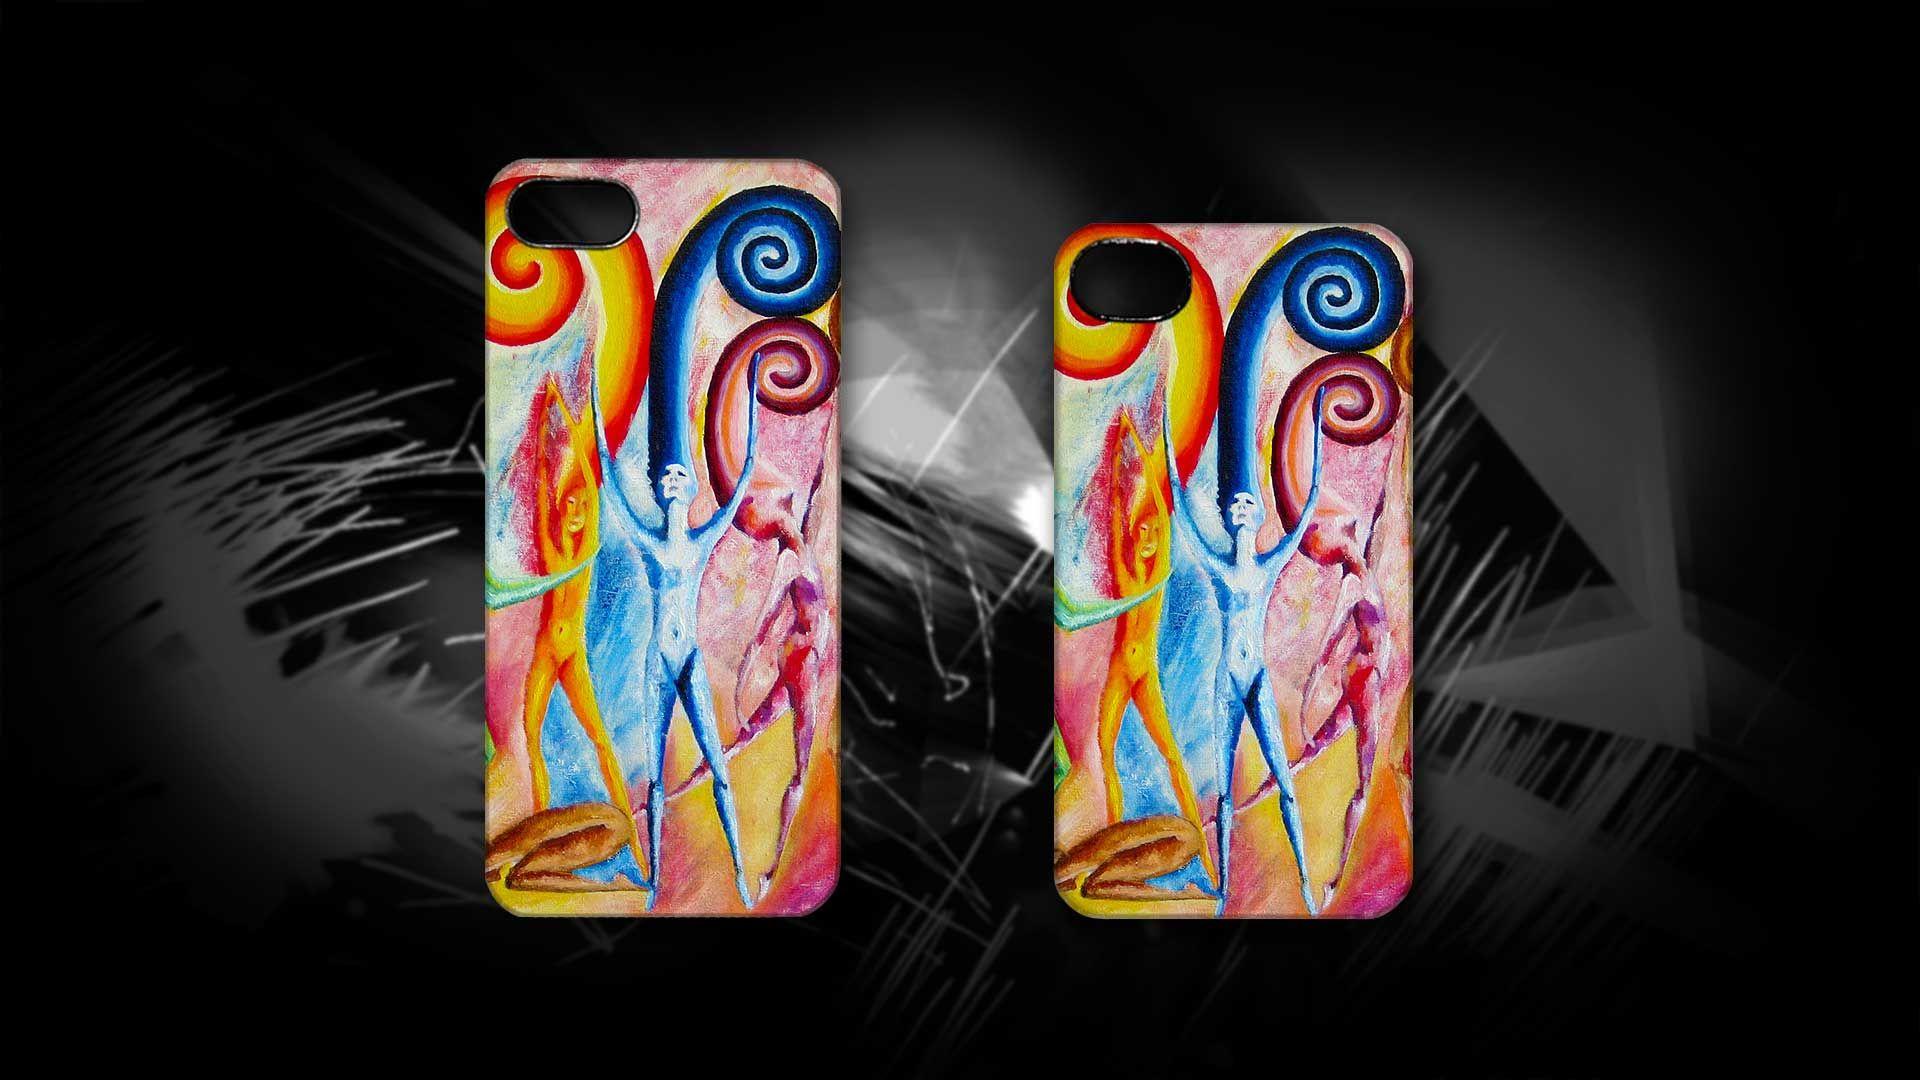 'Prosyashie' by Zlata Yablochkina.  #Prayers #Spirits #iPhone #Cases #Art #Artmobilis